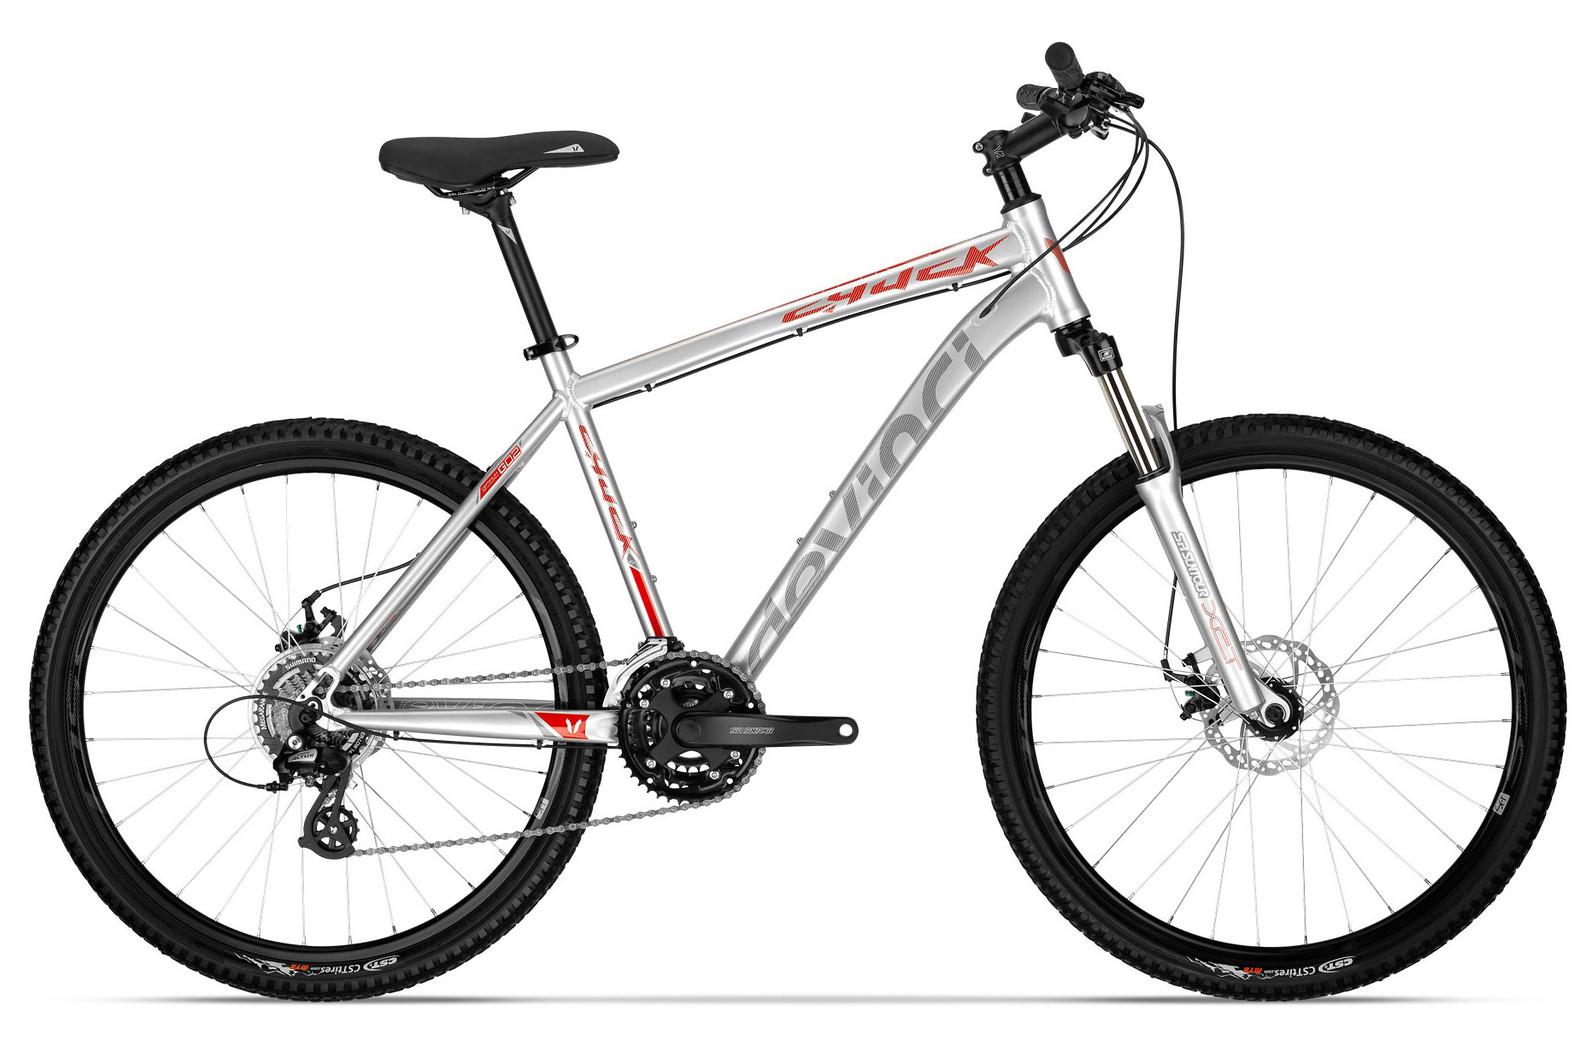 Bike - 2014 Devinci Chuck S - Silver